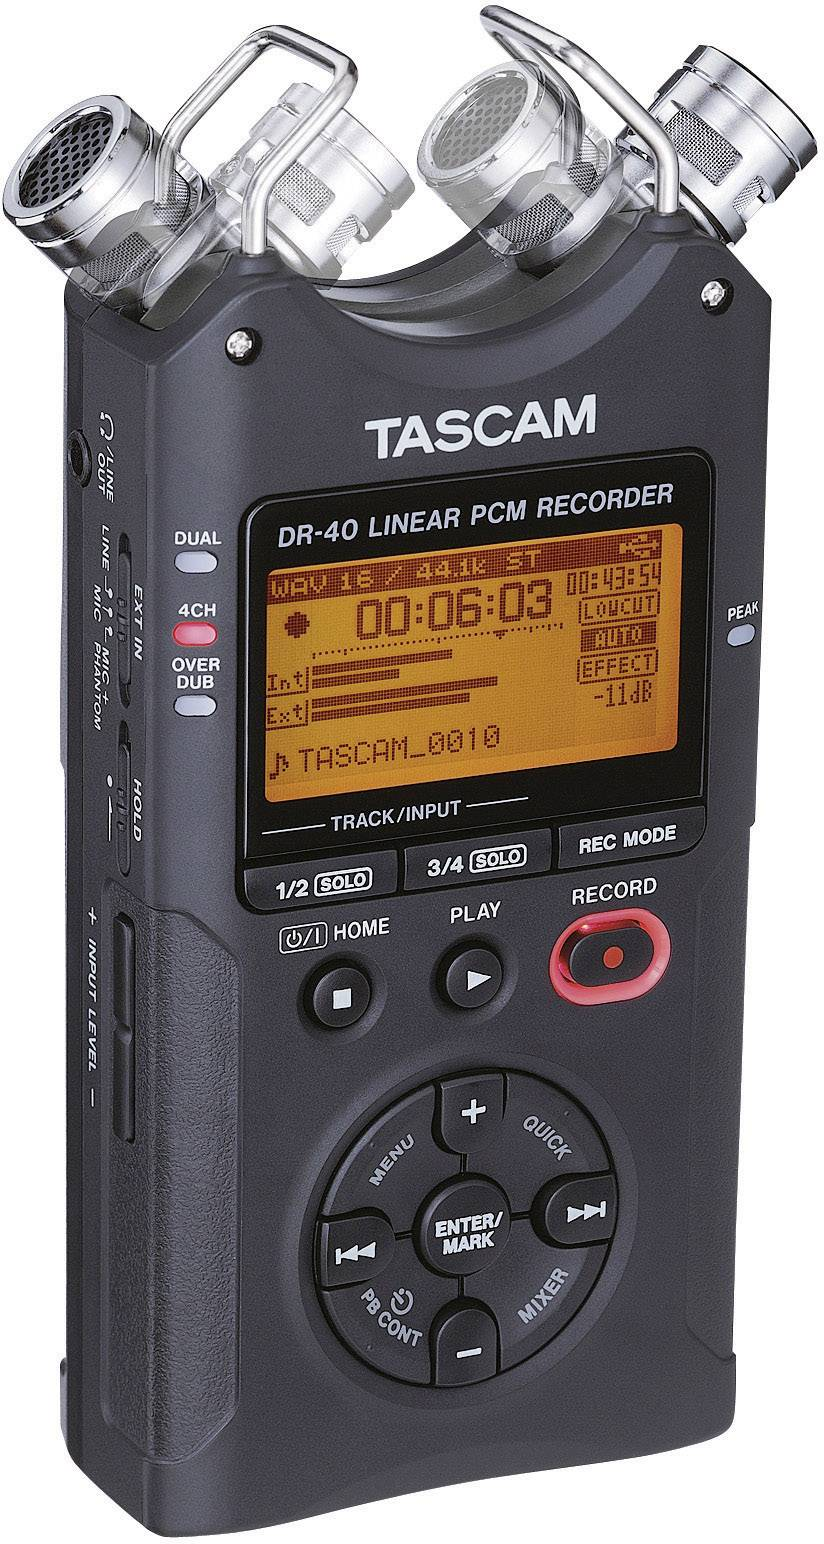 Mobilný audio rekordér Tascam DR-40, čierna